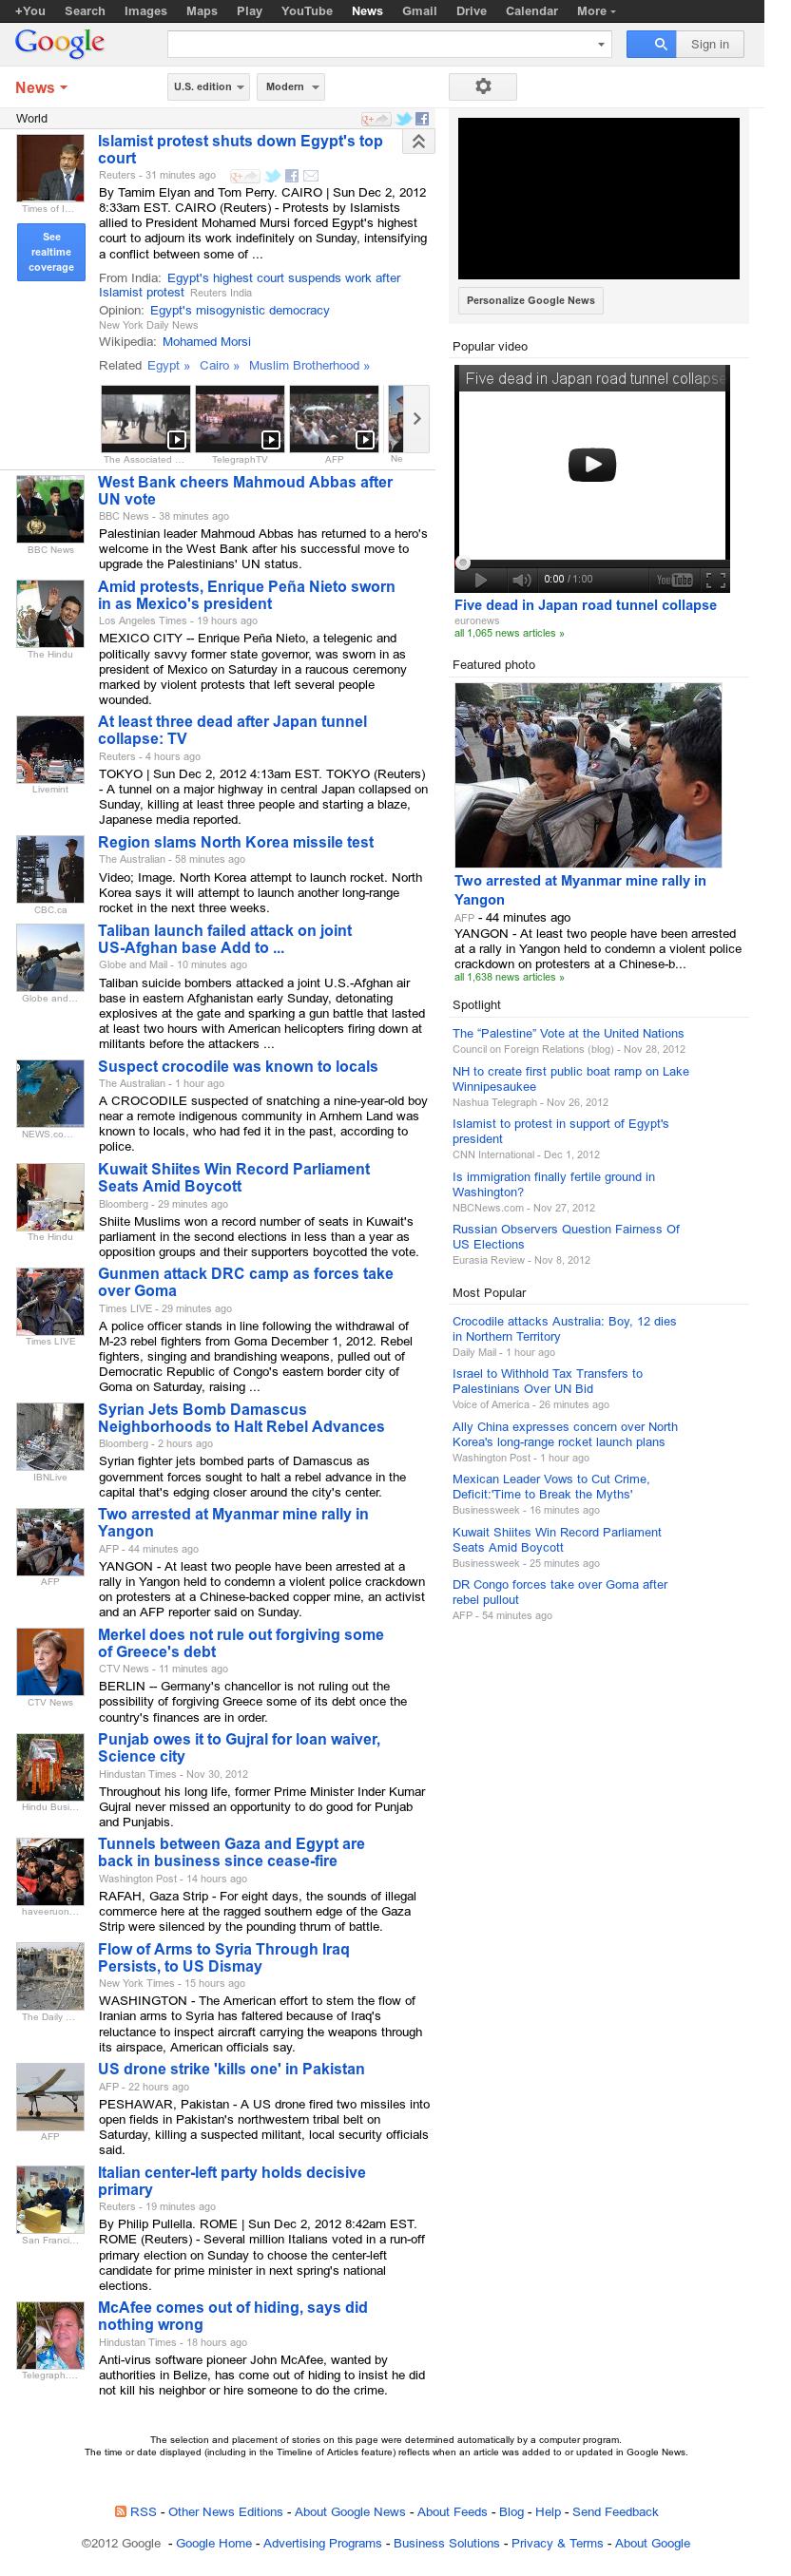 Google News: World at Sunday Dec. 2, 2012, 2:11 p.m. UTC